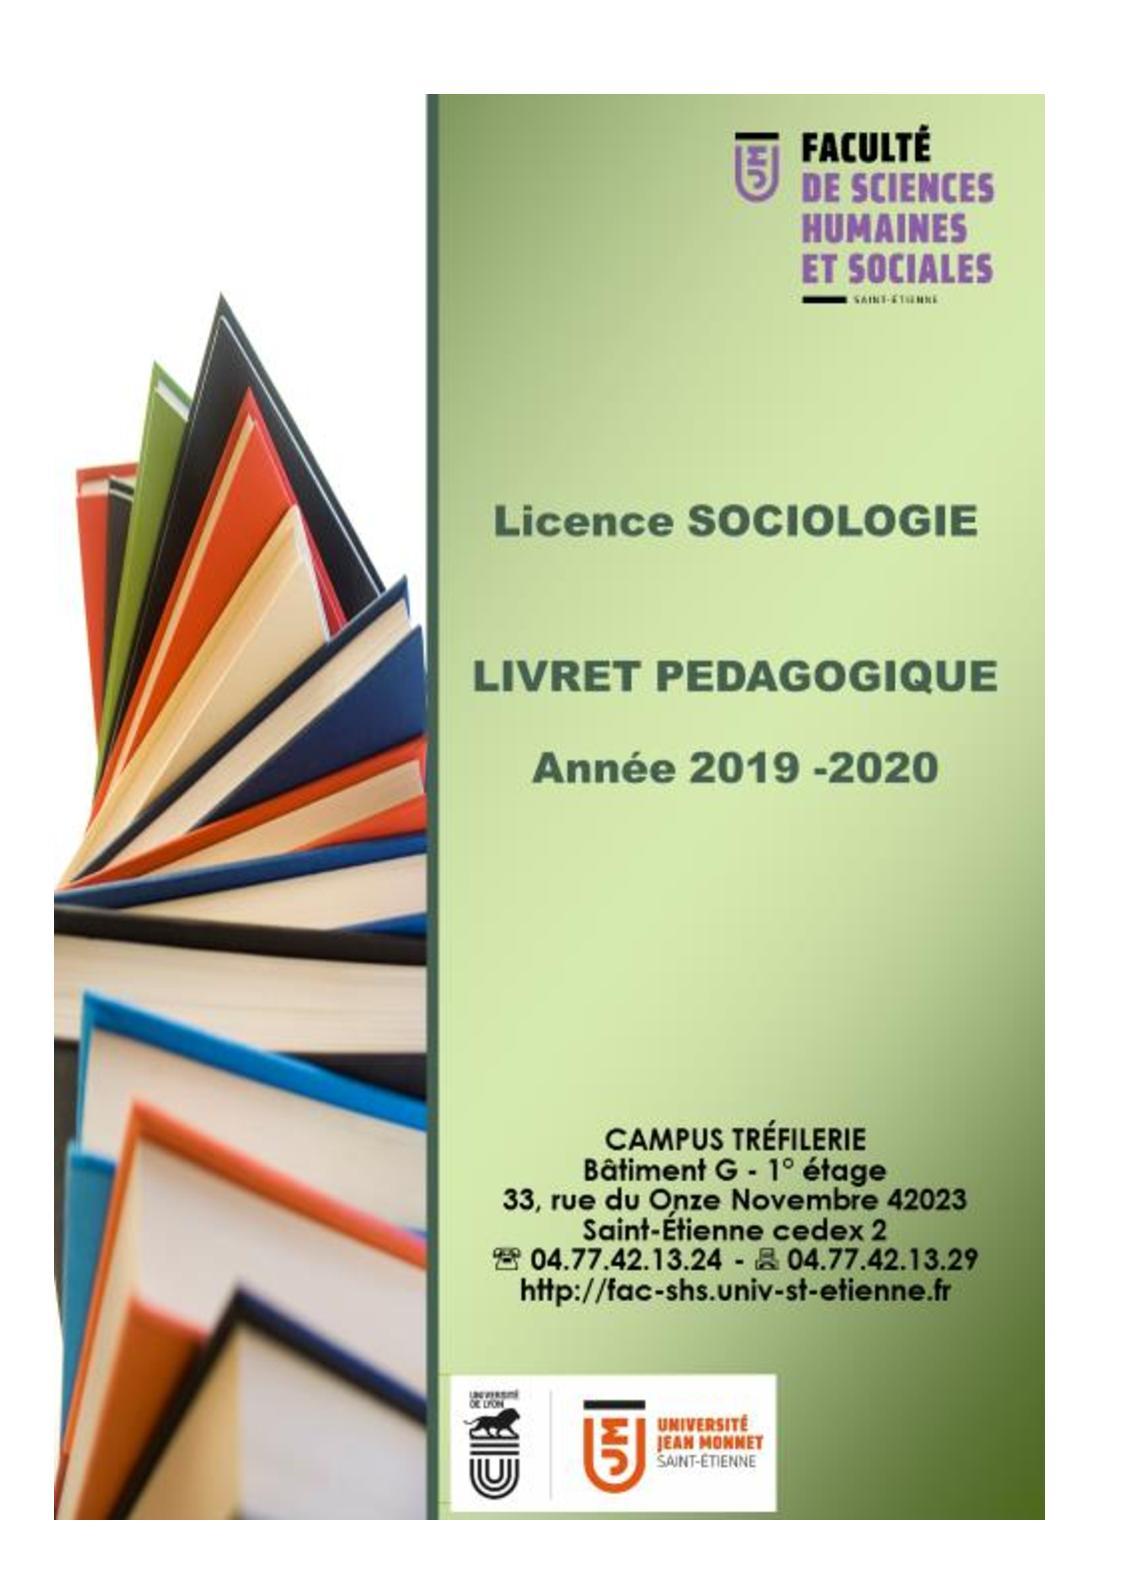 Calendrier Universitaire Paul Sabatier 2019 2020.Calameo Livret Sociologie 2019 2020